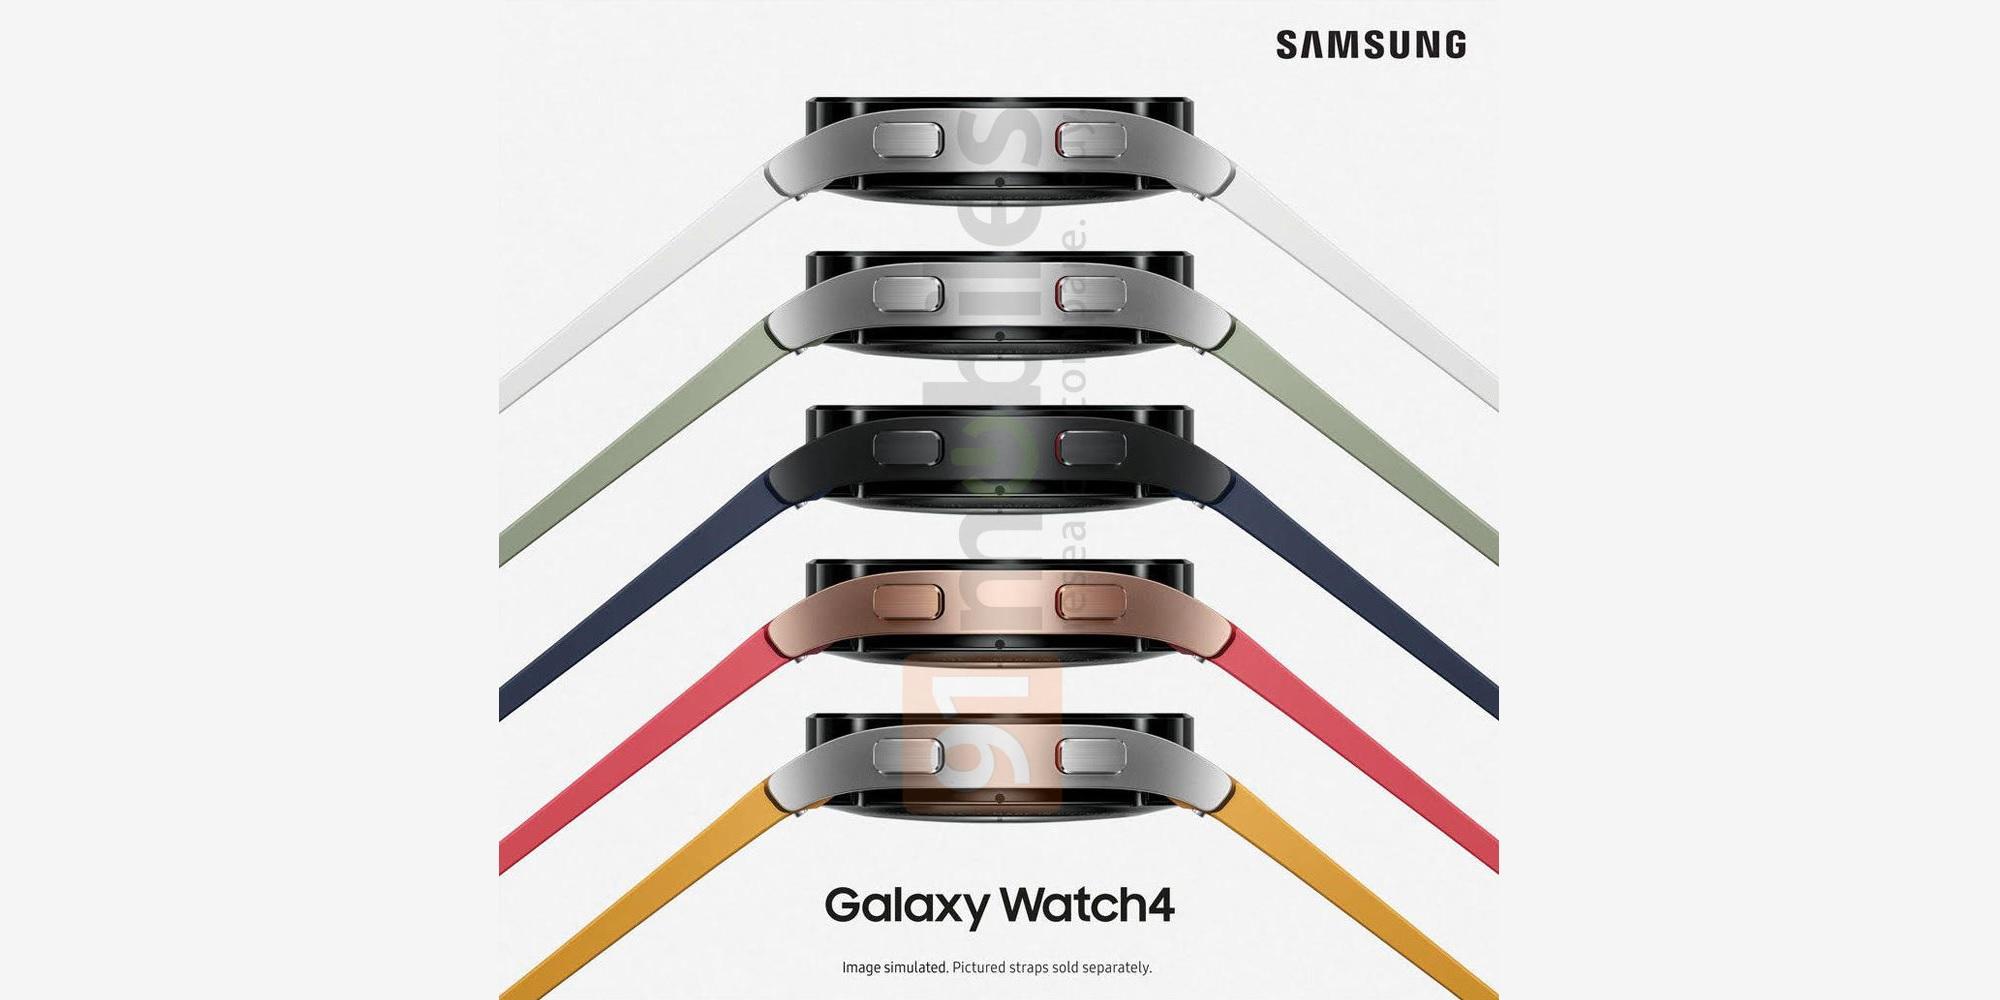 Samsung Galaxy Watch 4 smartwatch